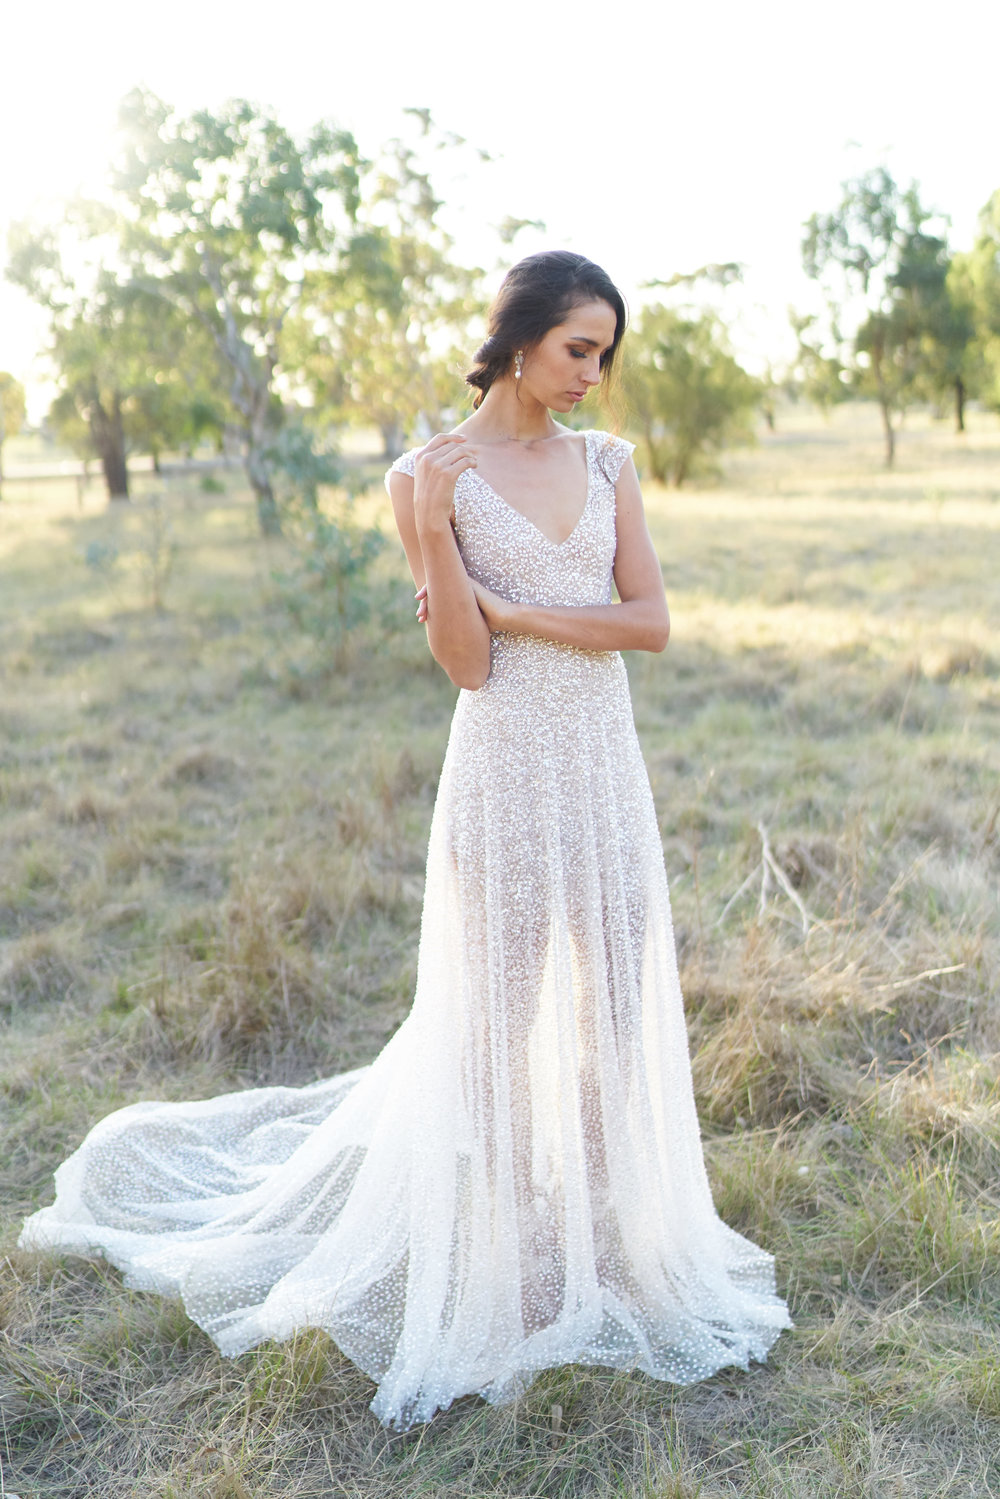 Anna Campbell Bridal | Sequin Sydney Wedding Dress | orders@annacampbell.com.au